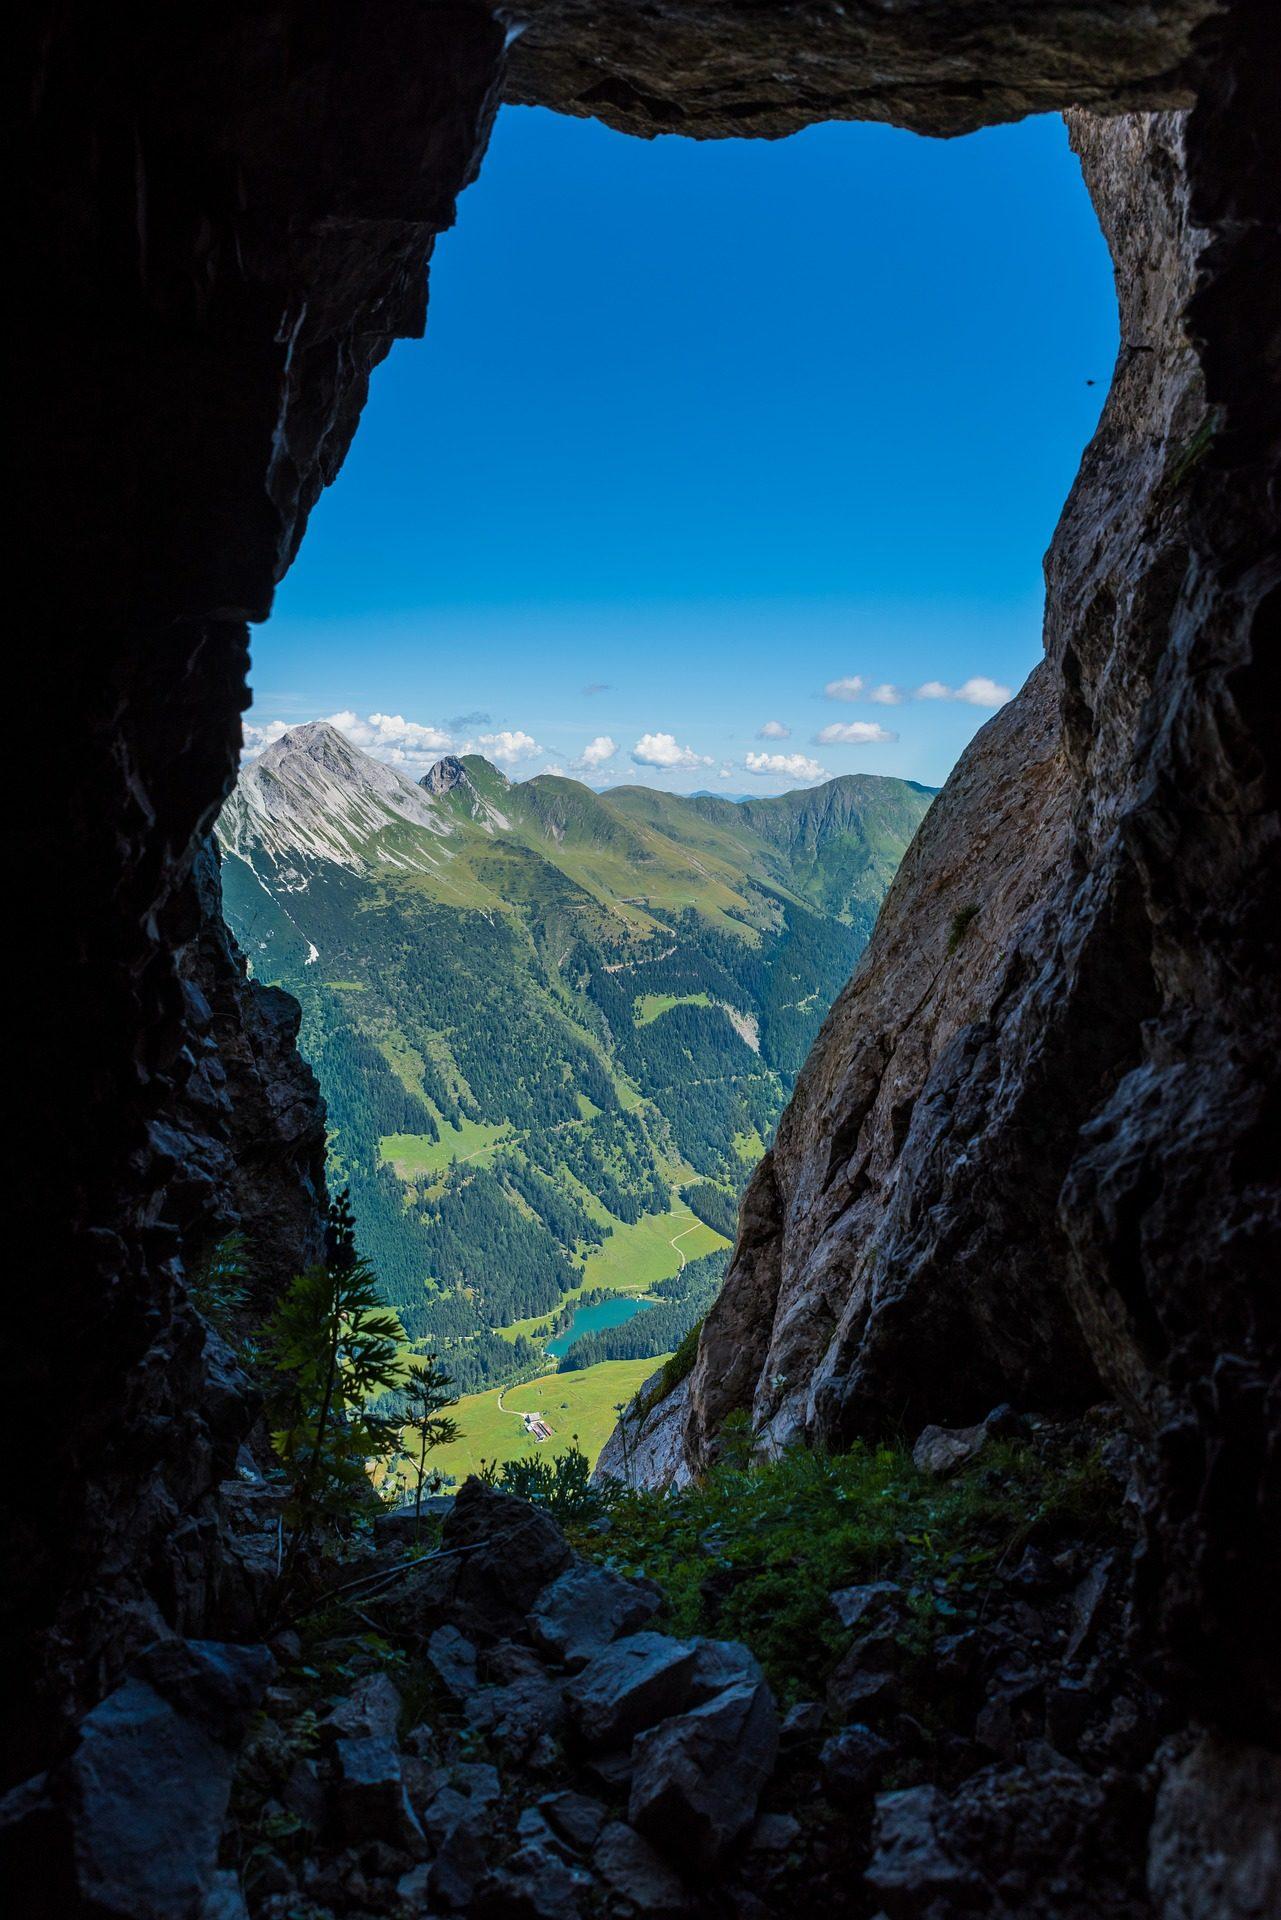 cueva, montañas, altura, alpes, escalada - Fondos de Pantalla HD - professor-falken.com